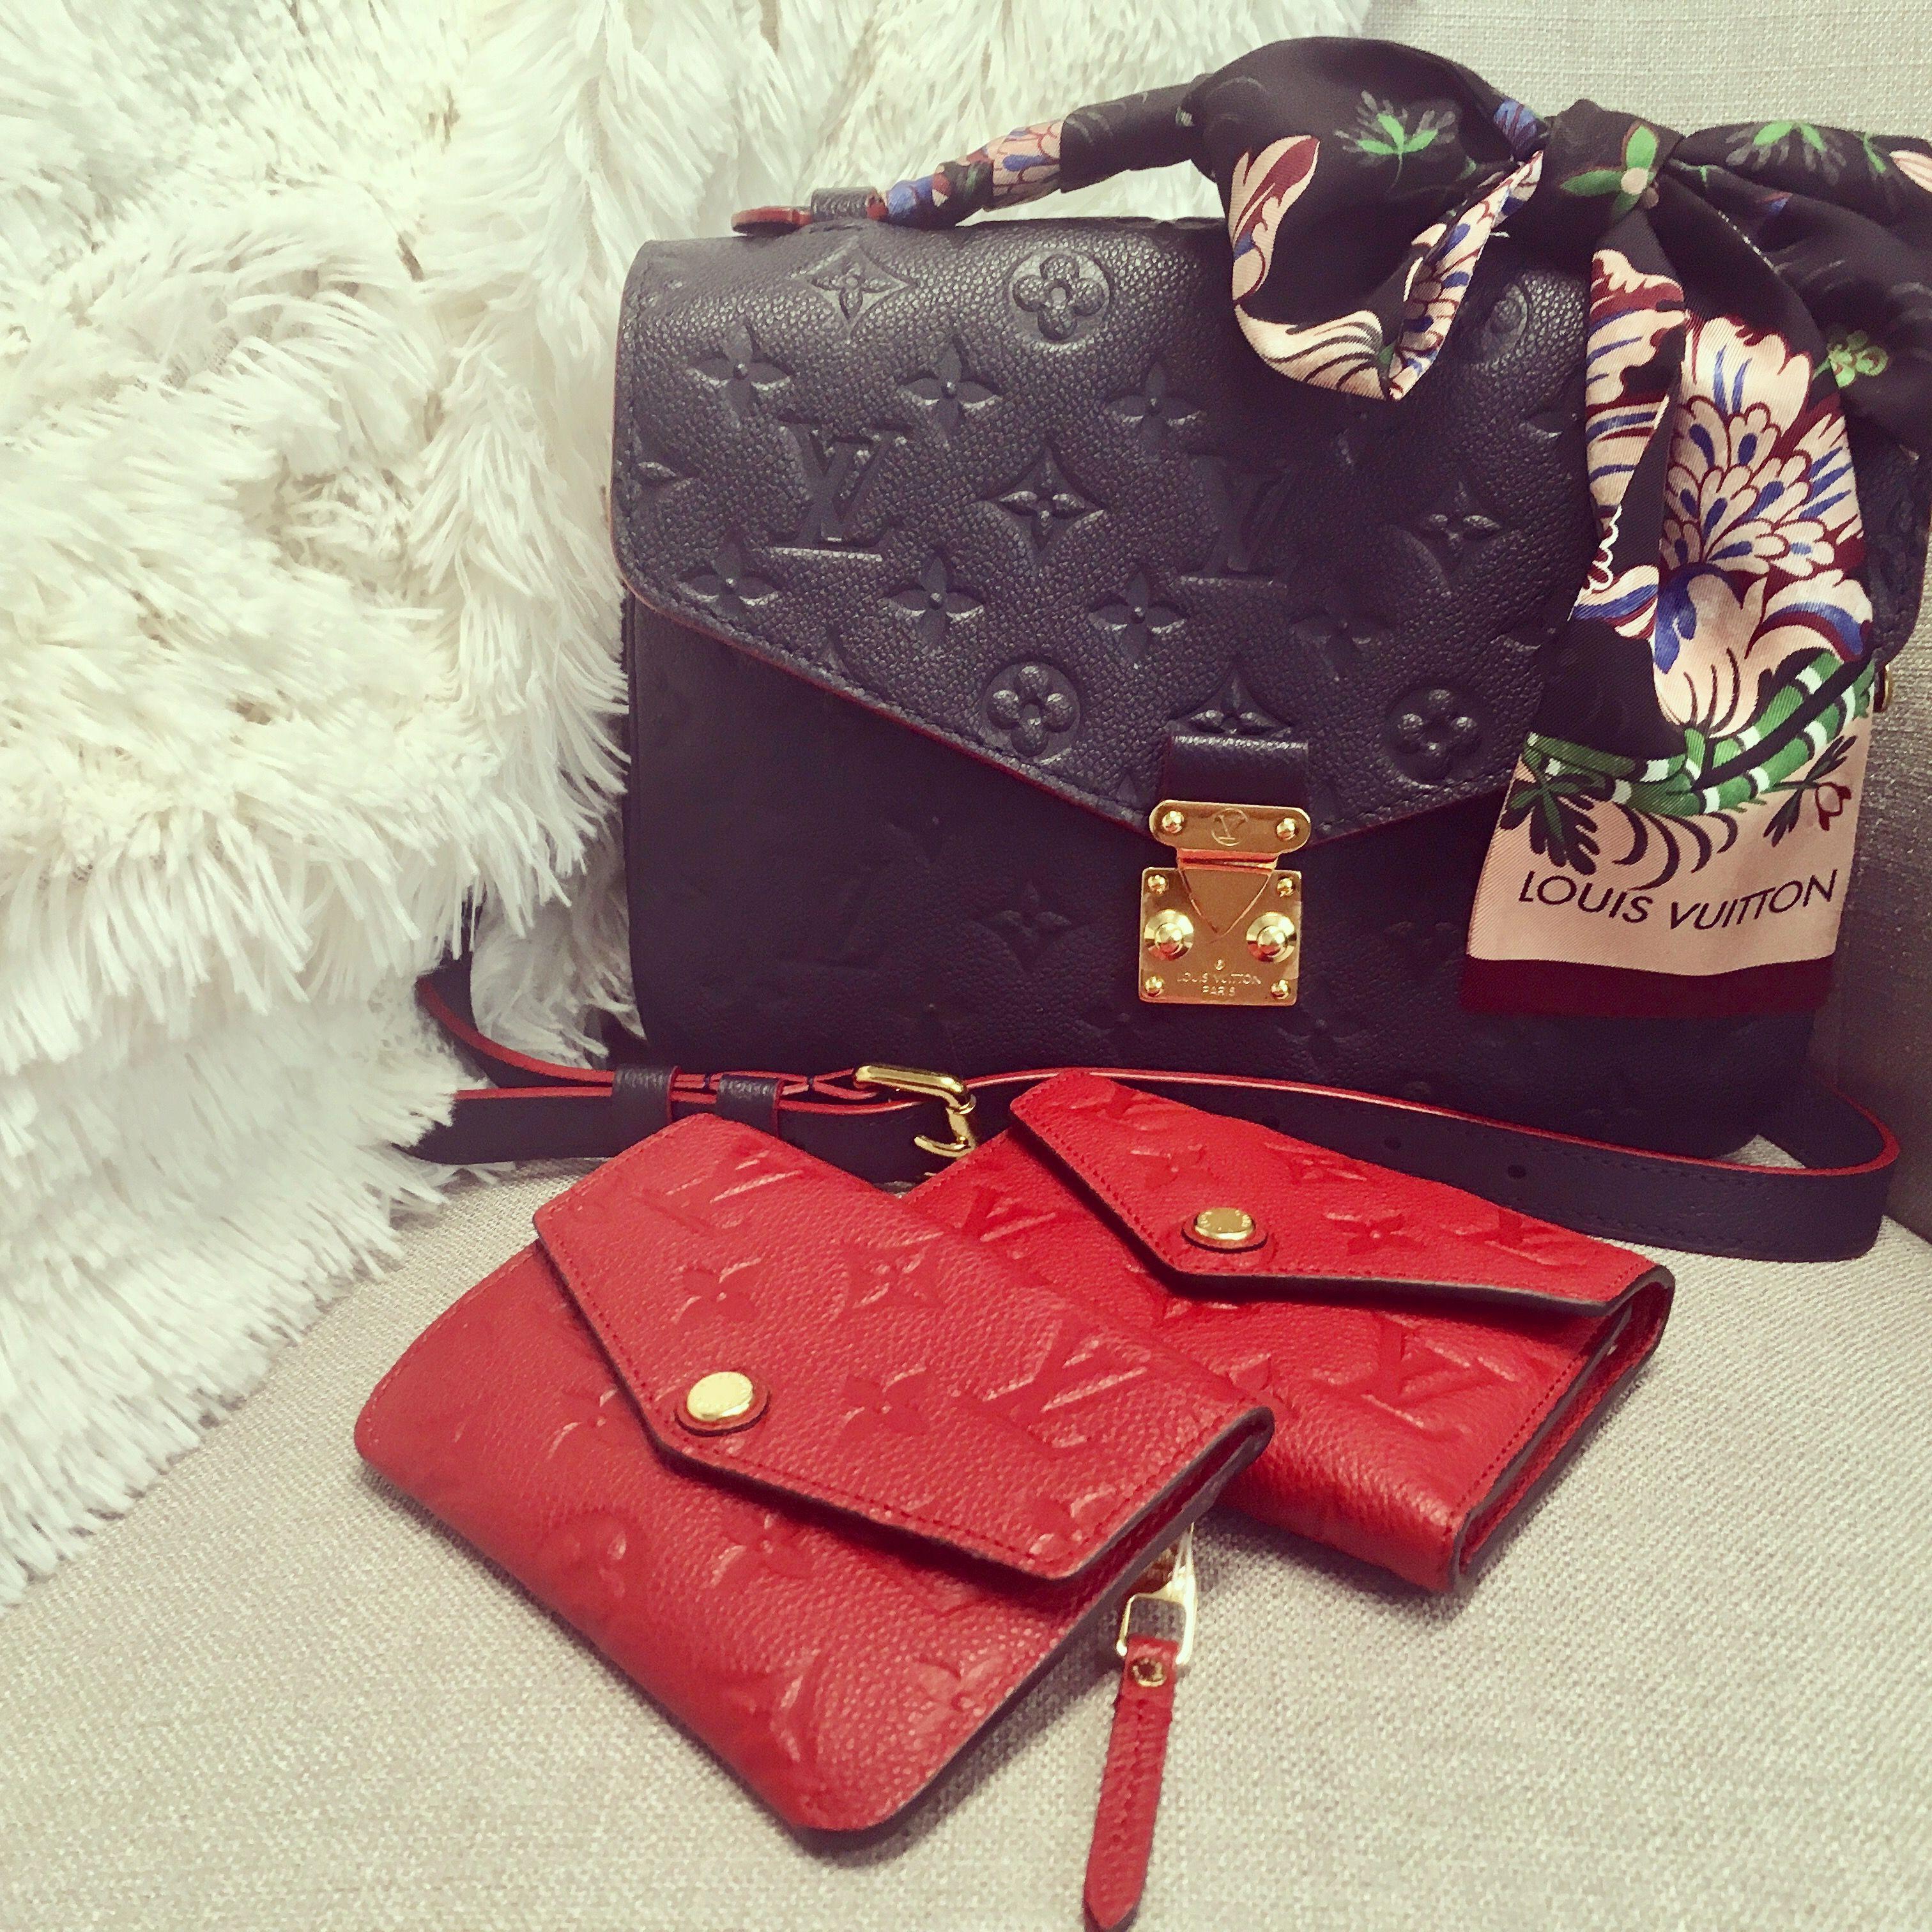 Japanese Used Luxury Bags